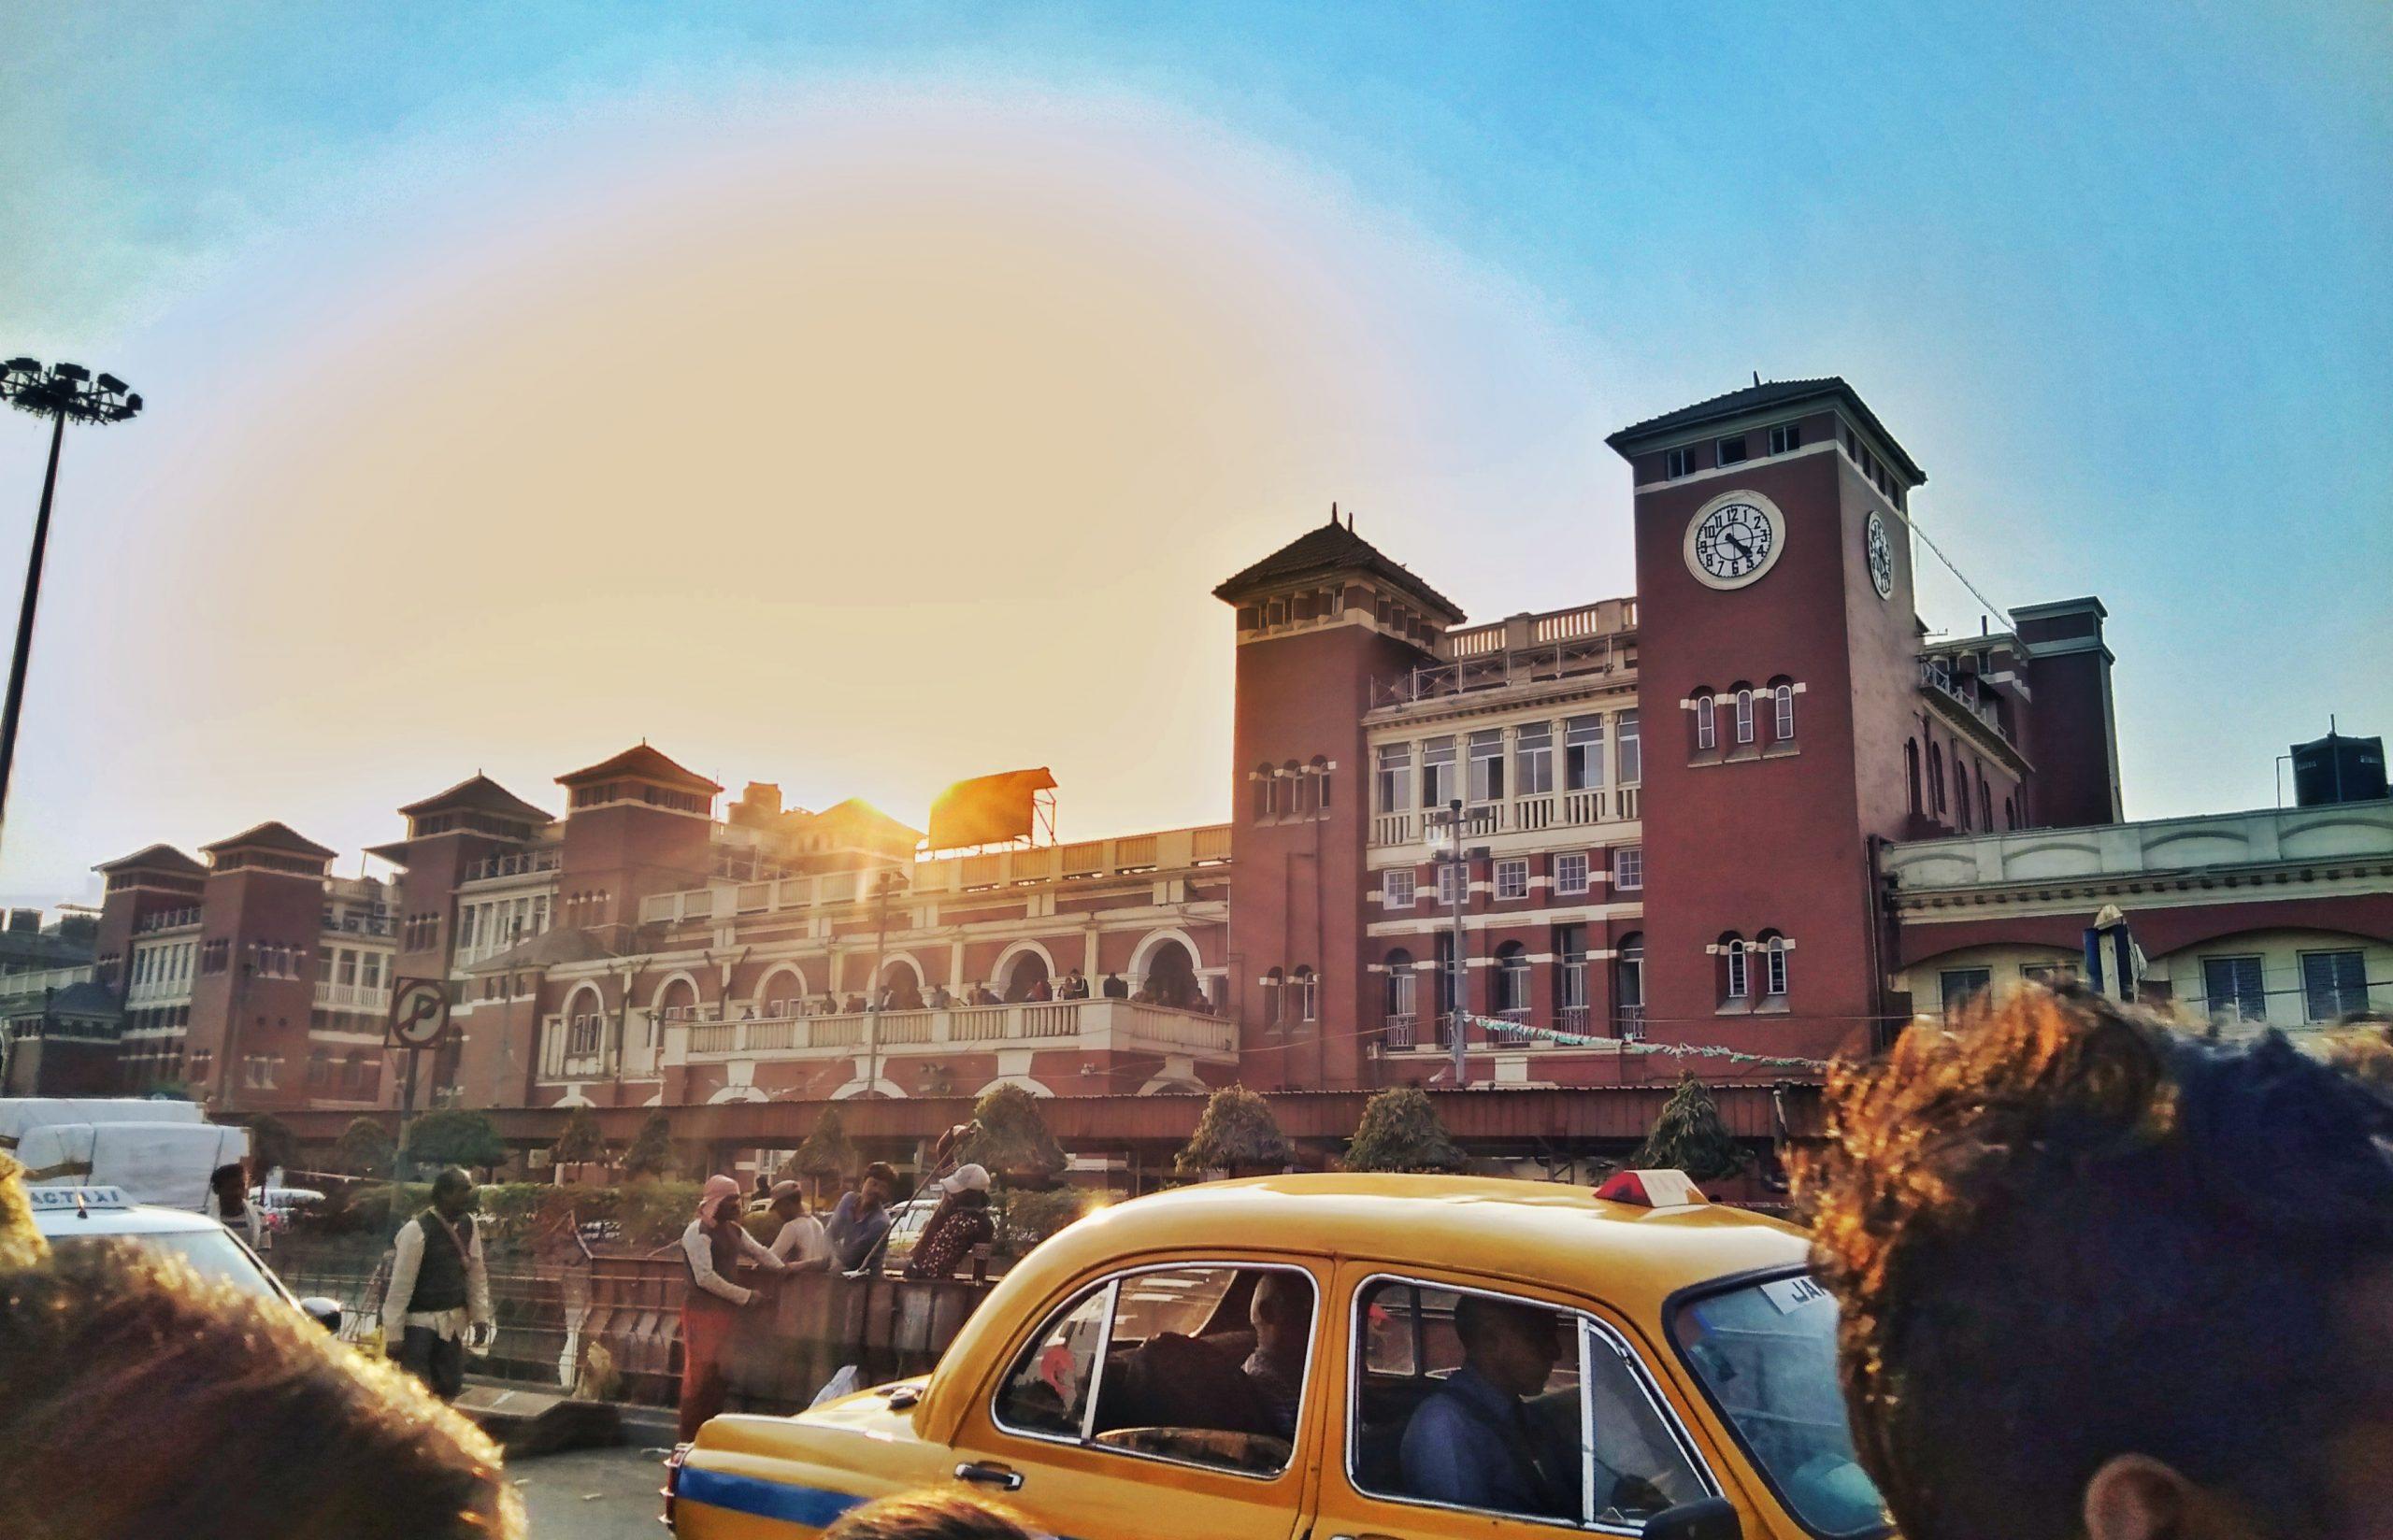 An old building in Kolkata